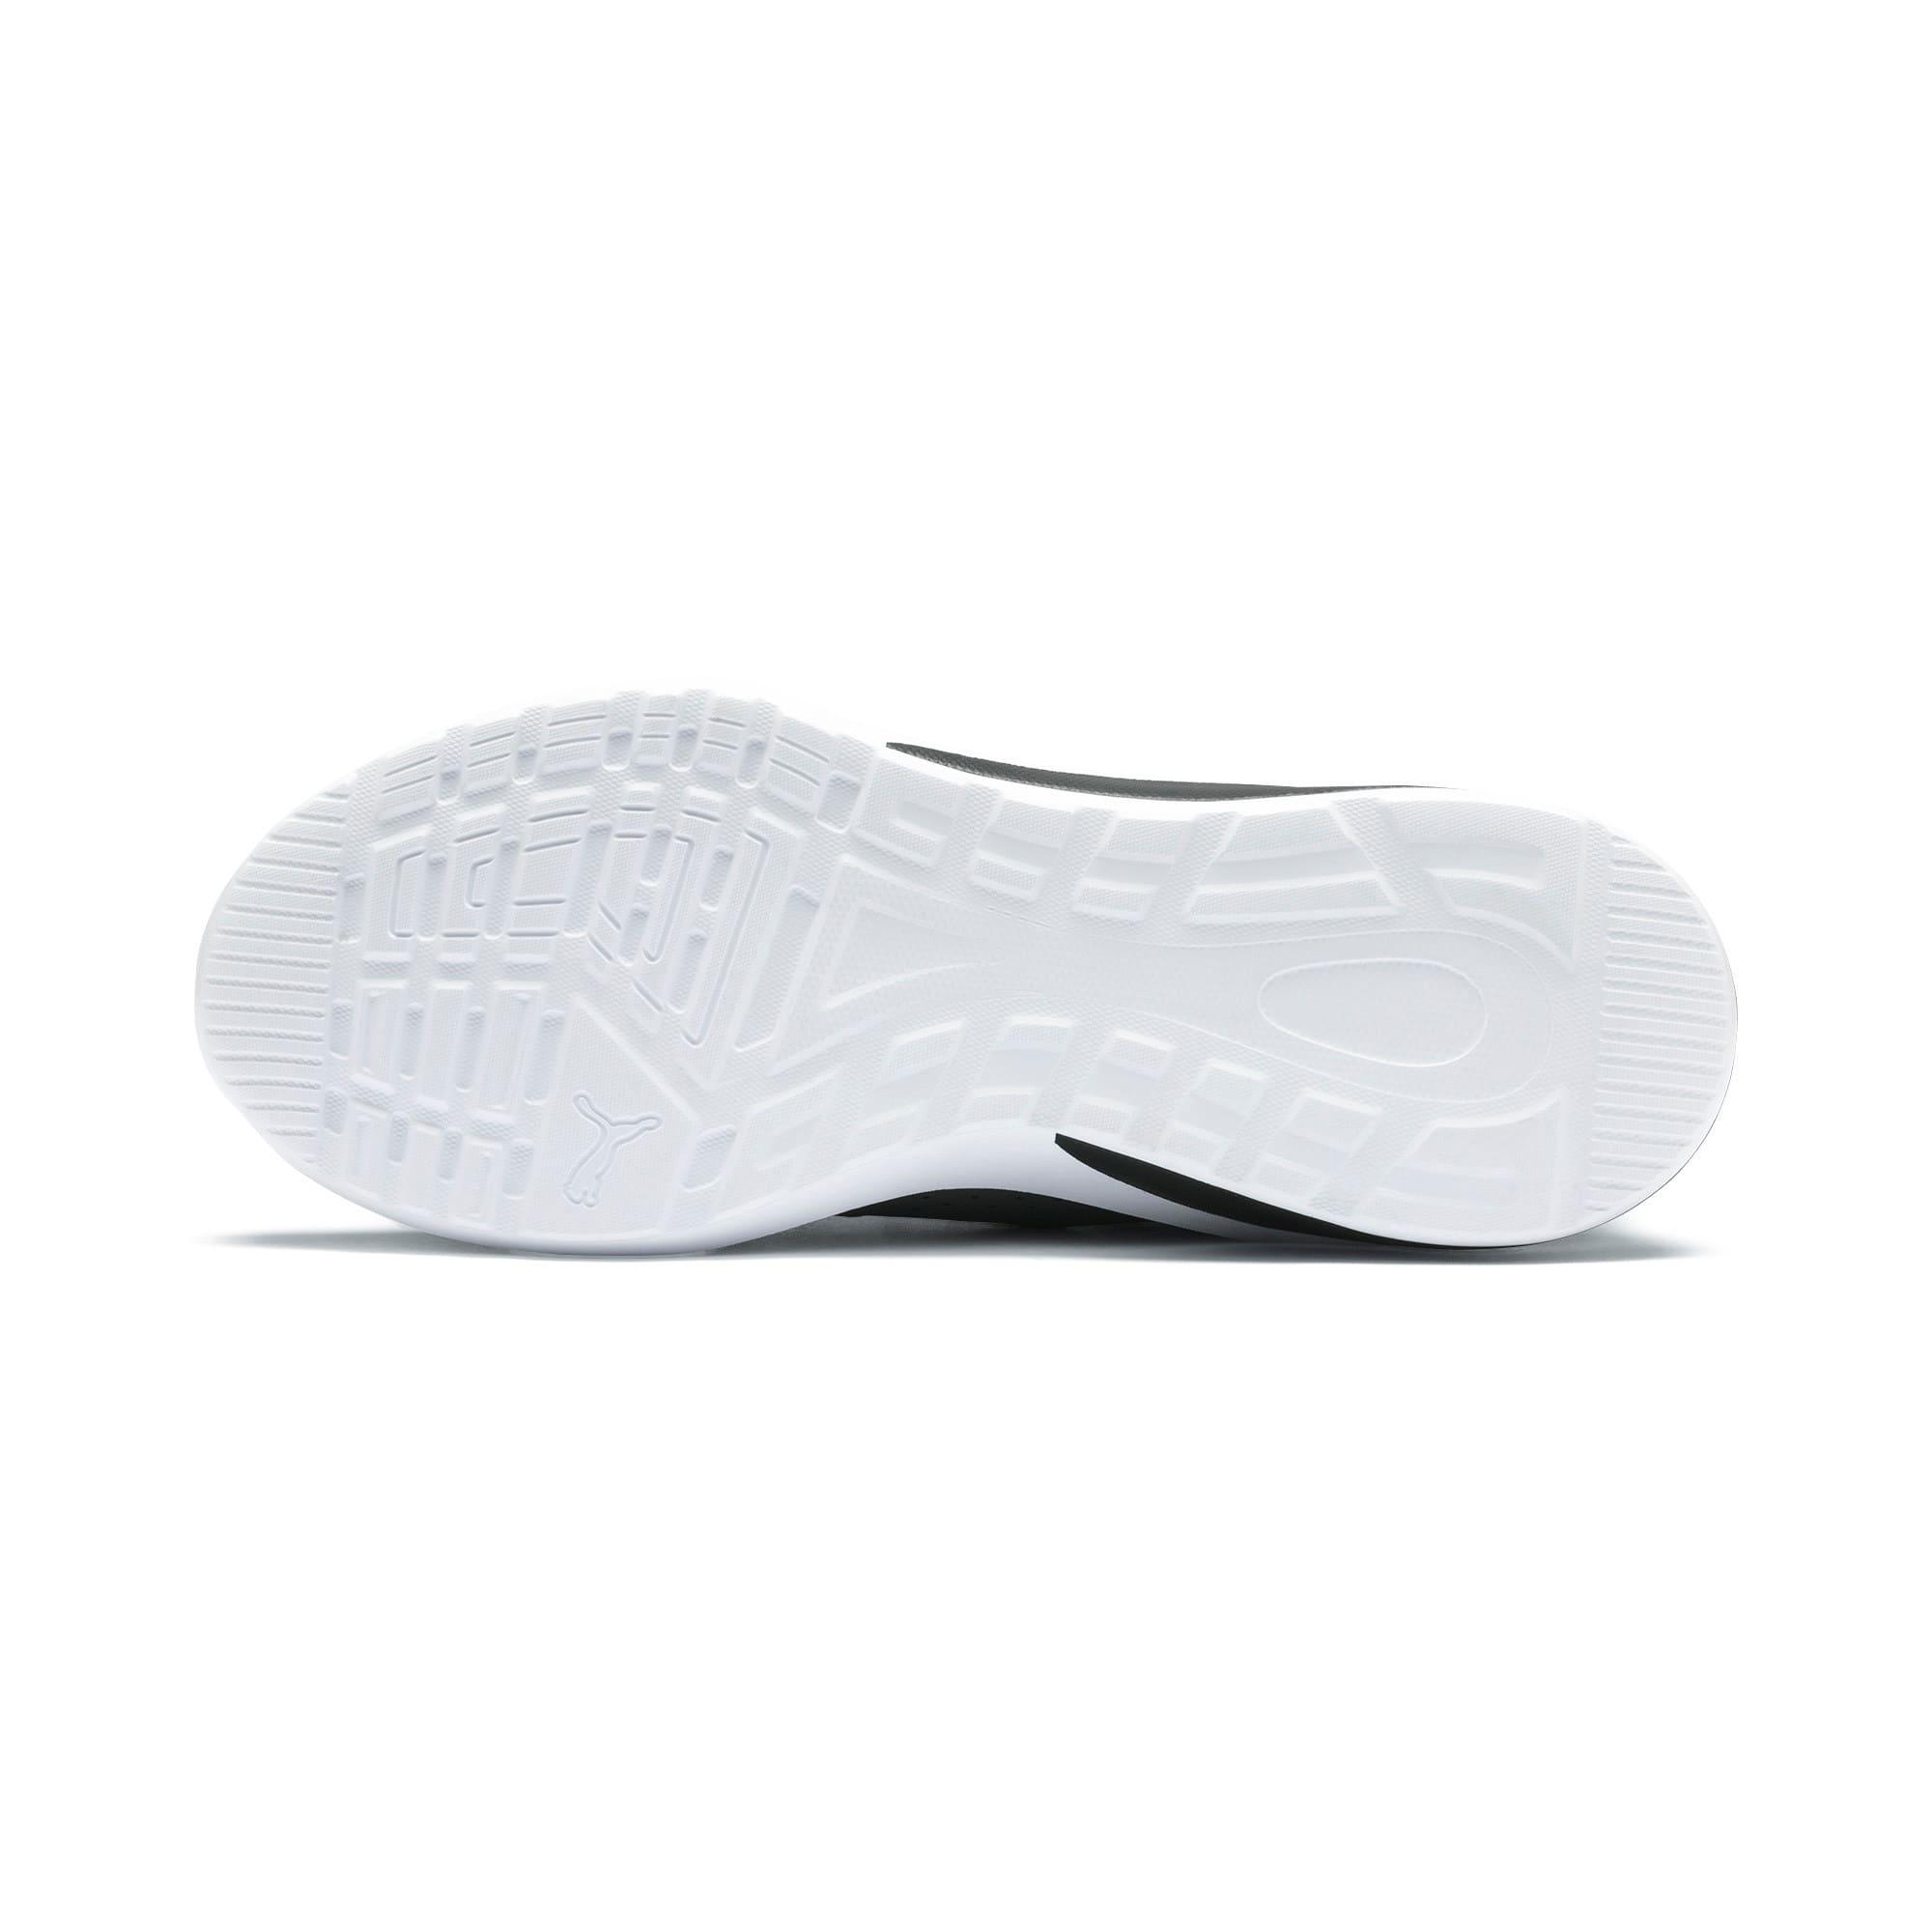 Thumbnail 6 of Emergence Men's Running Shoes, CASTLEROCK-Puma Black, medium-IND